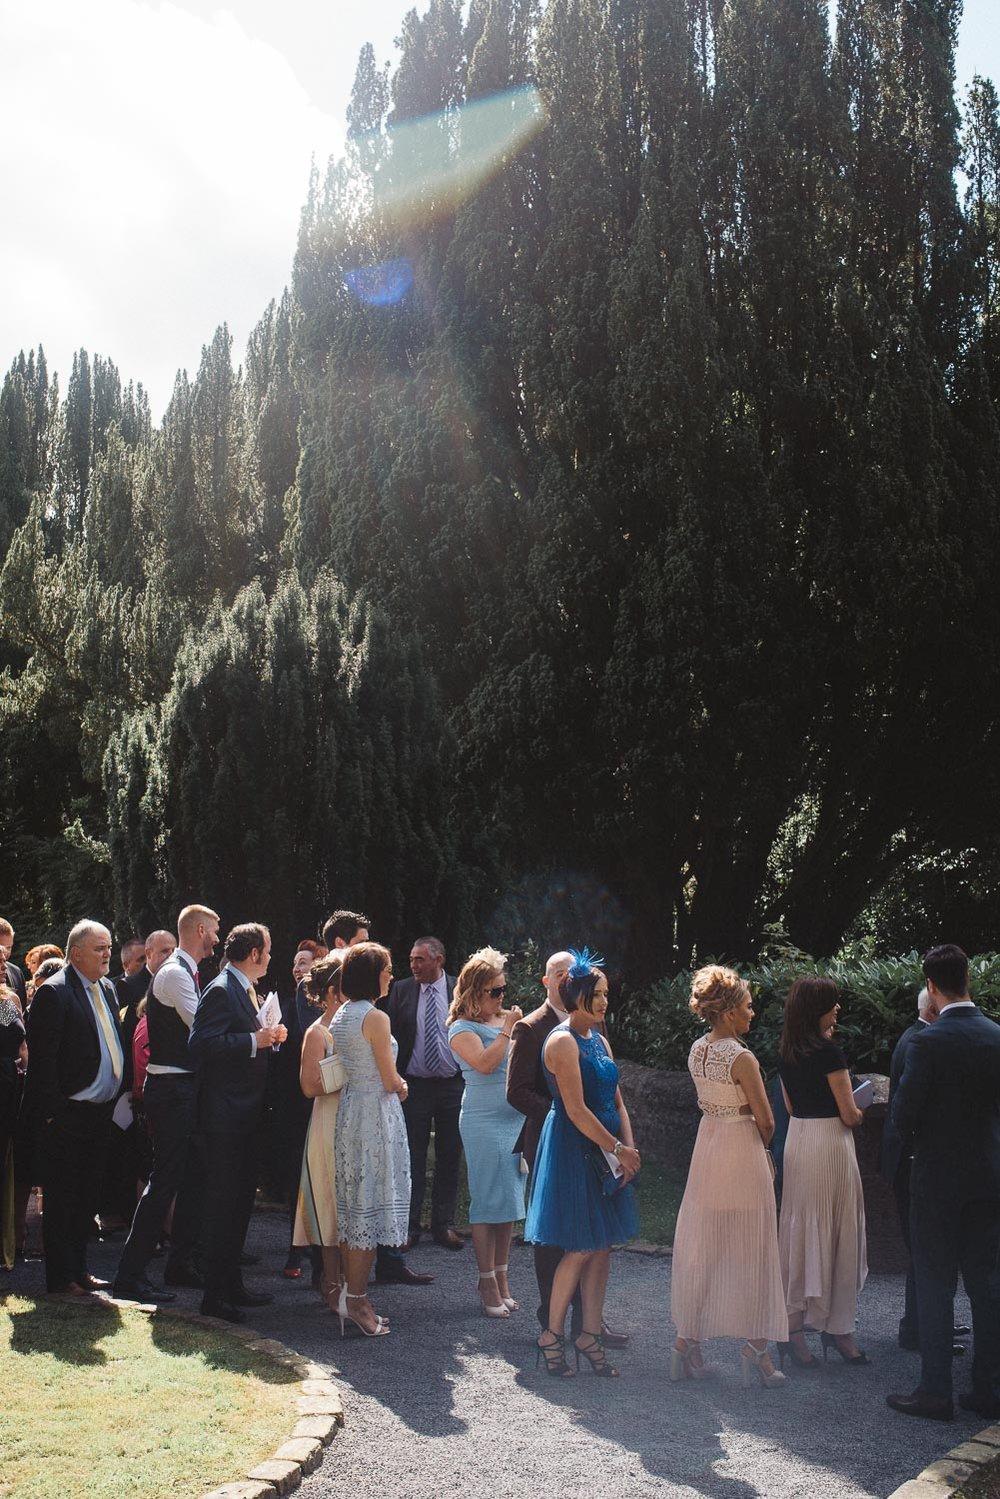 Guests mingling outside chapel.